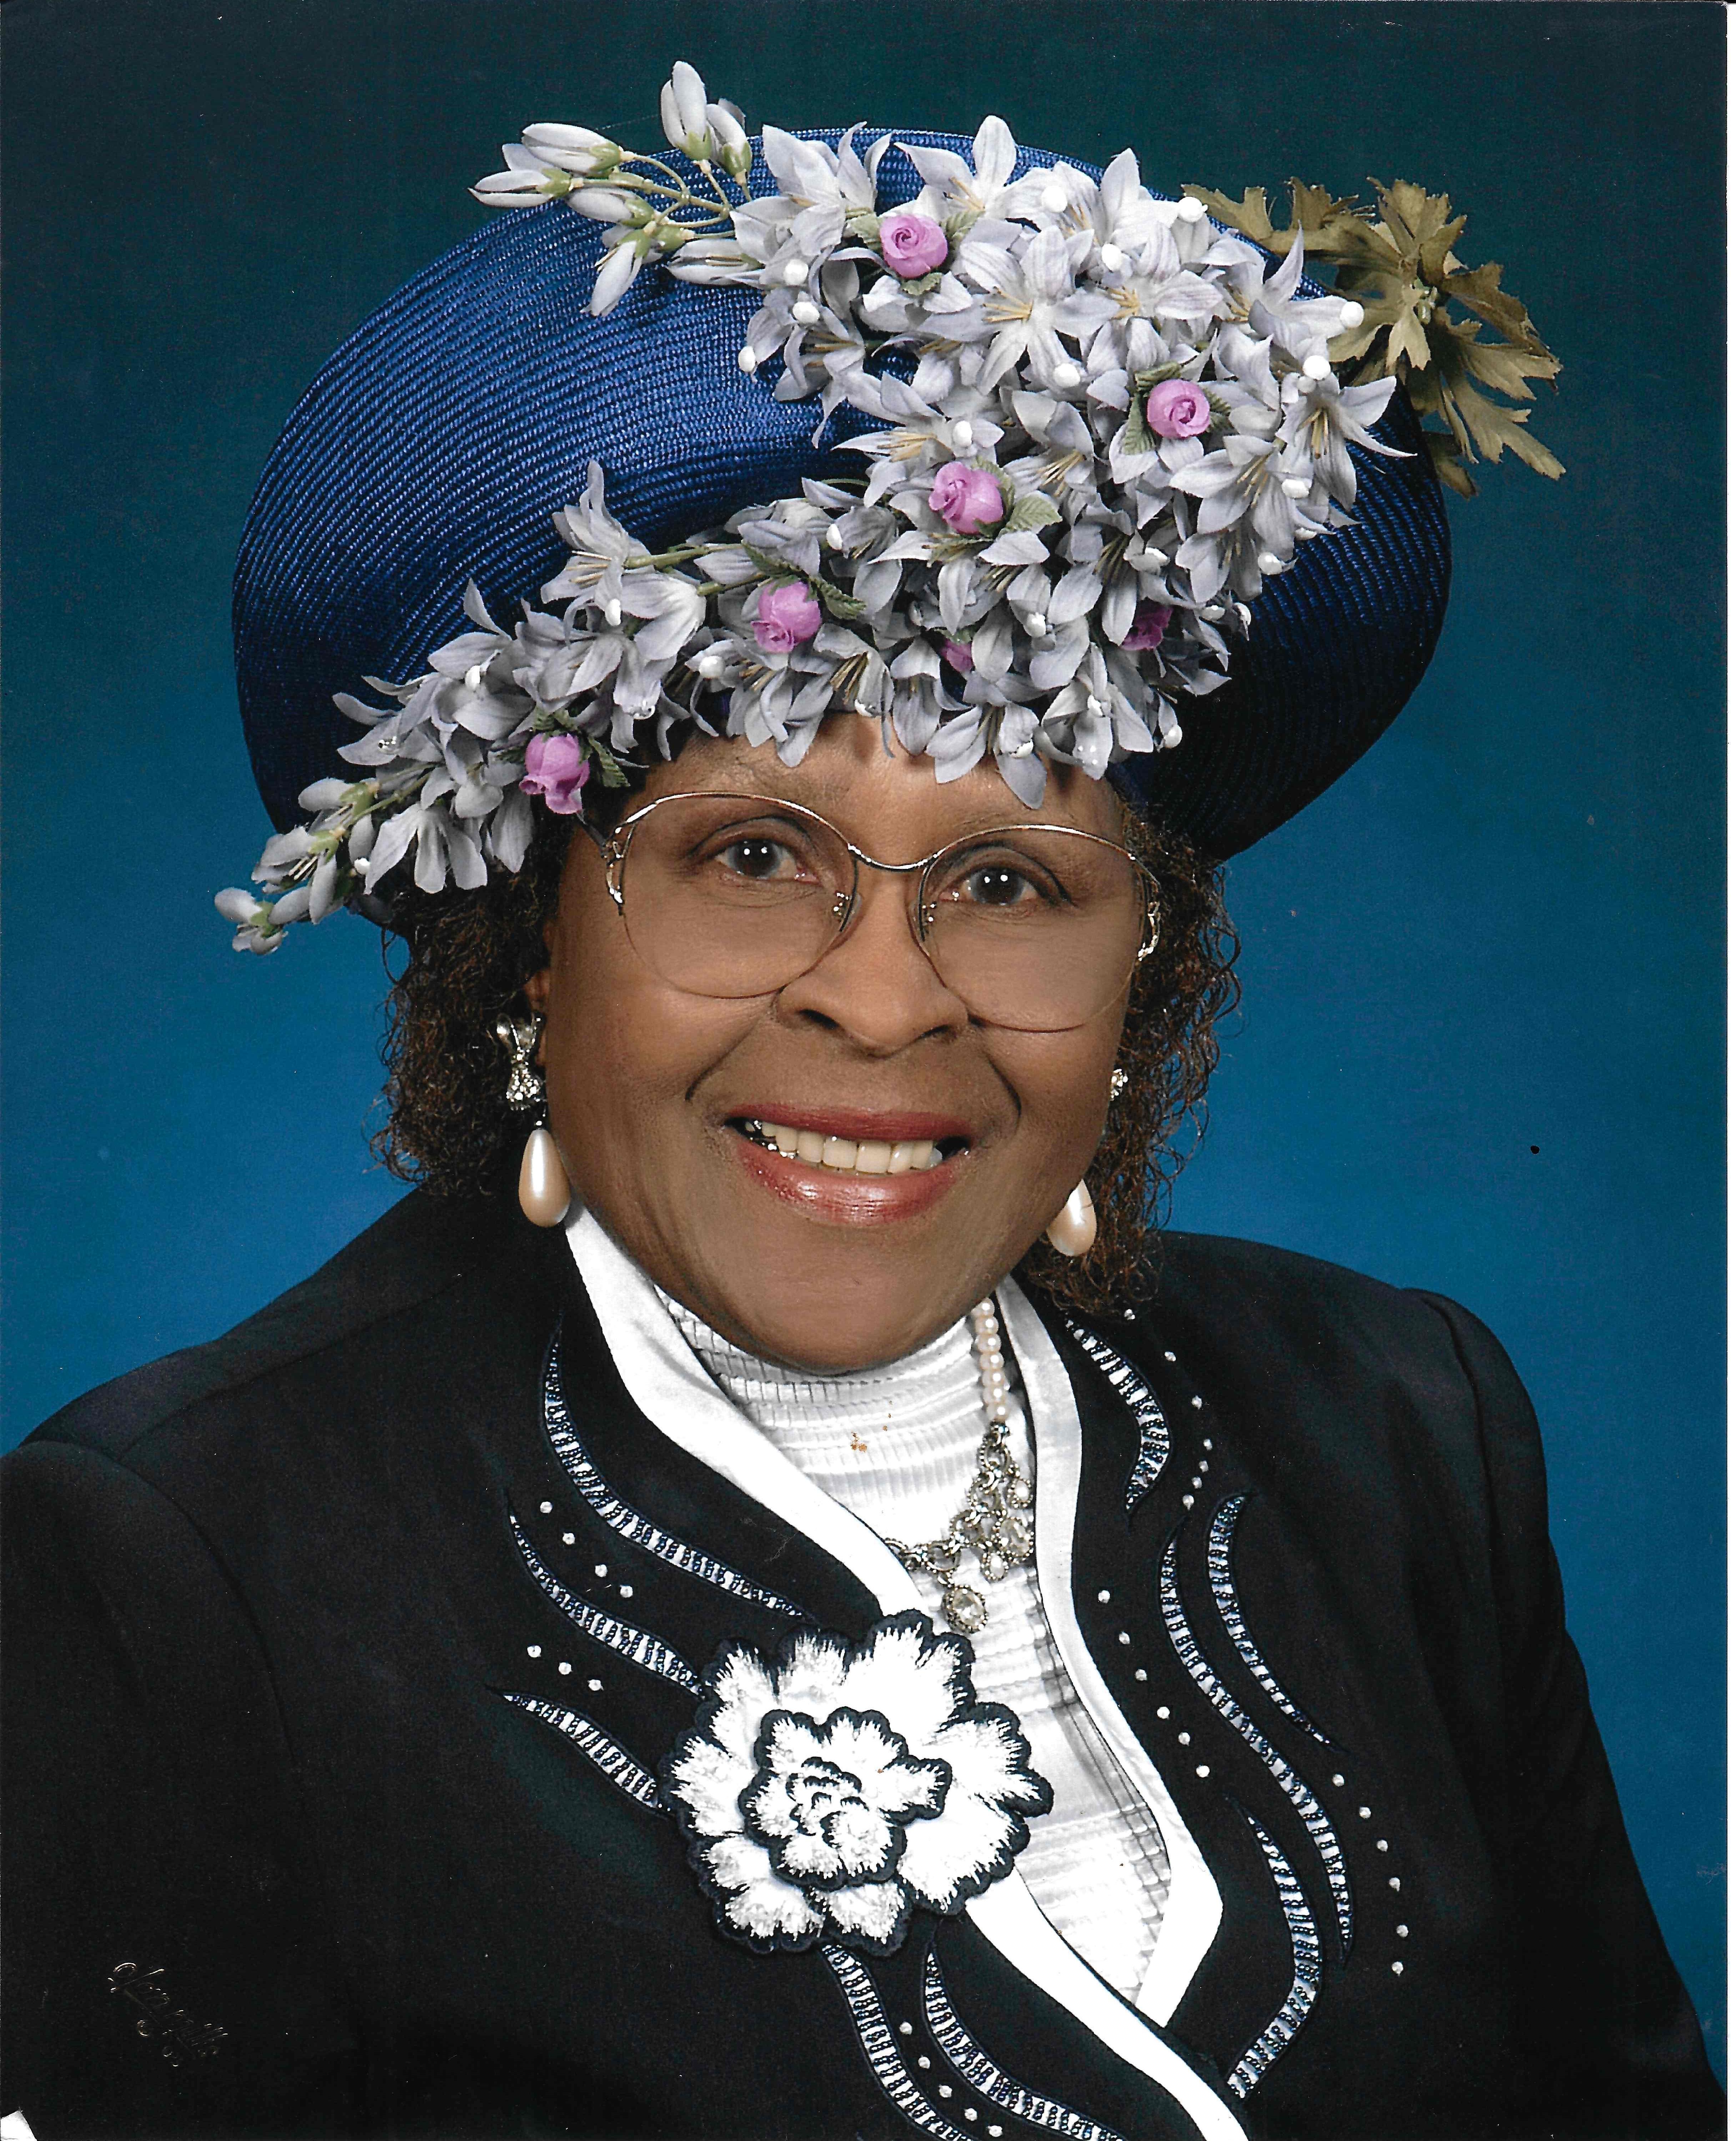 Rosa Lee Hightower